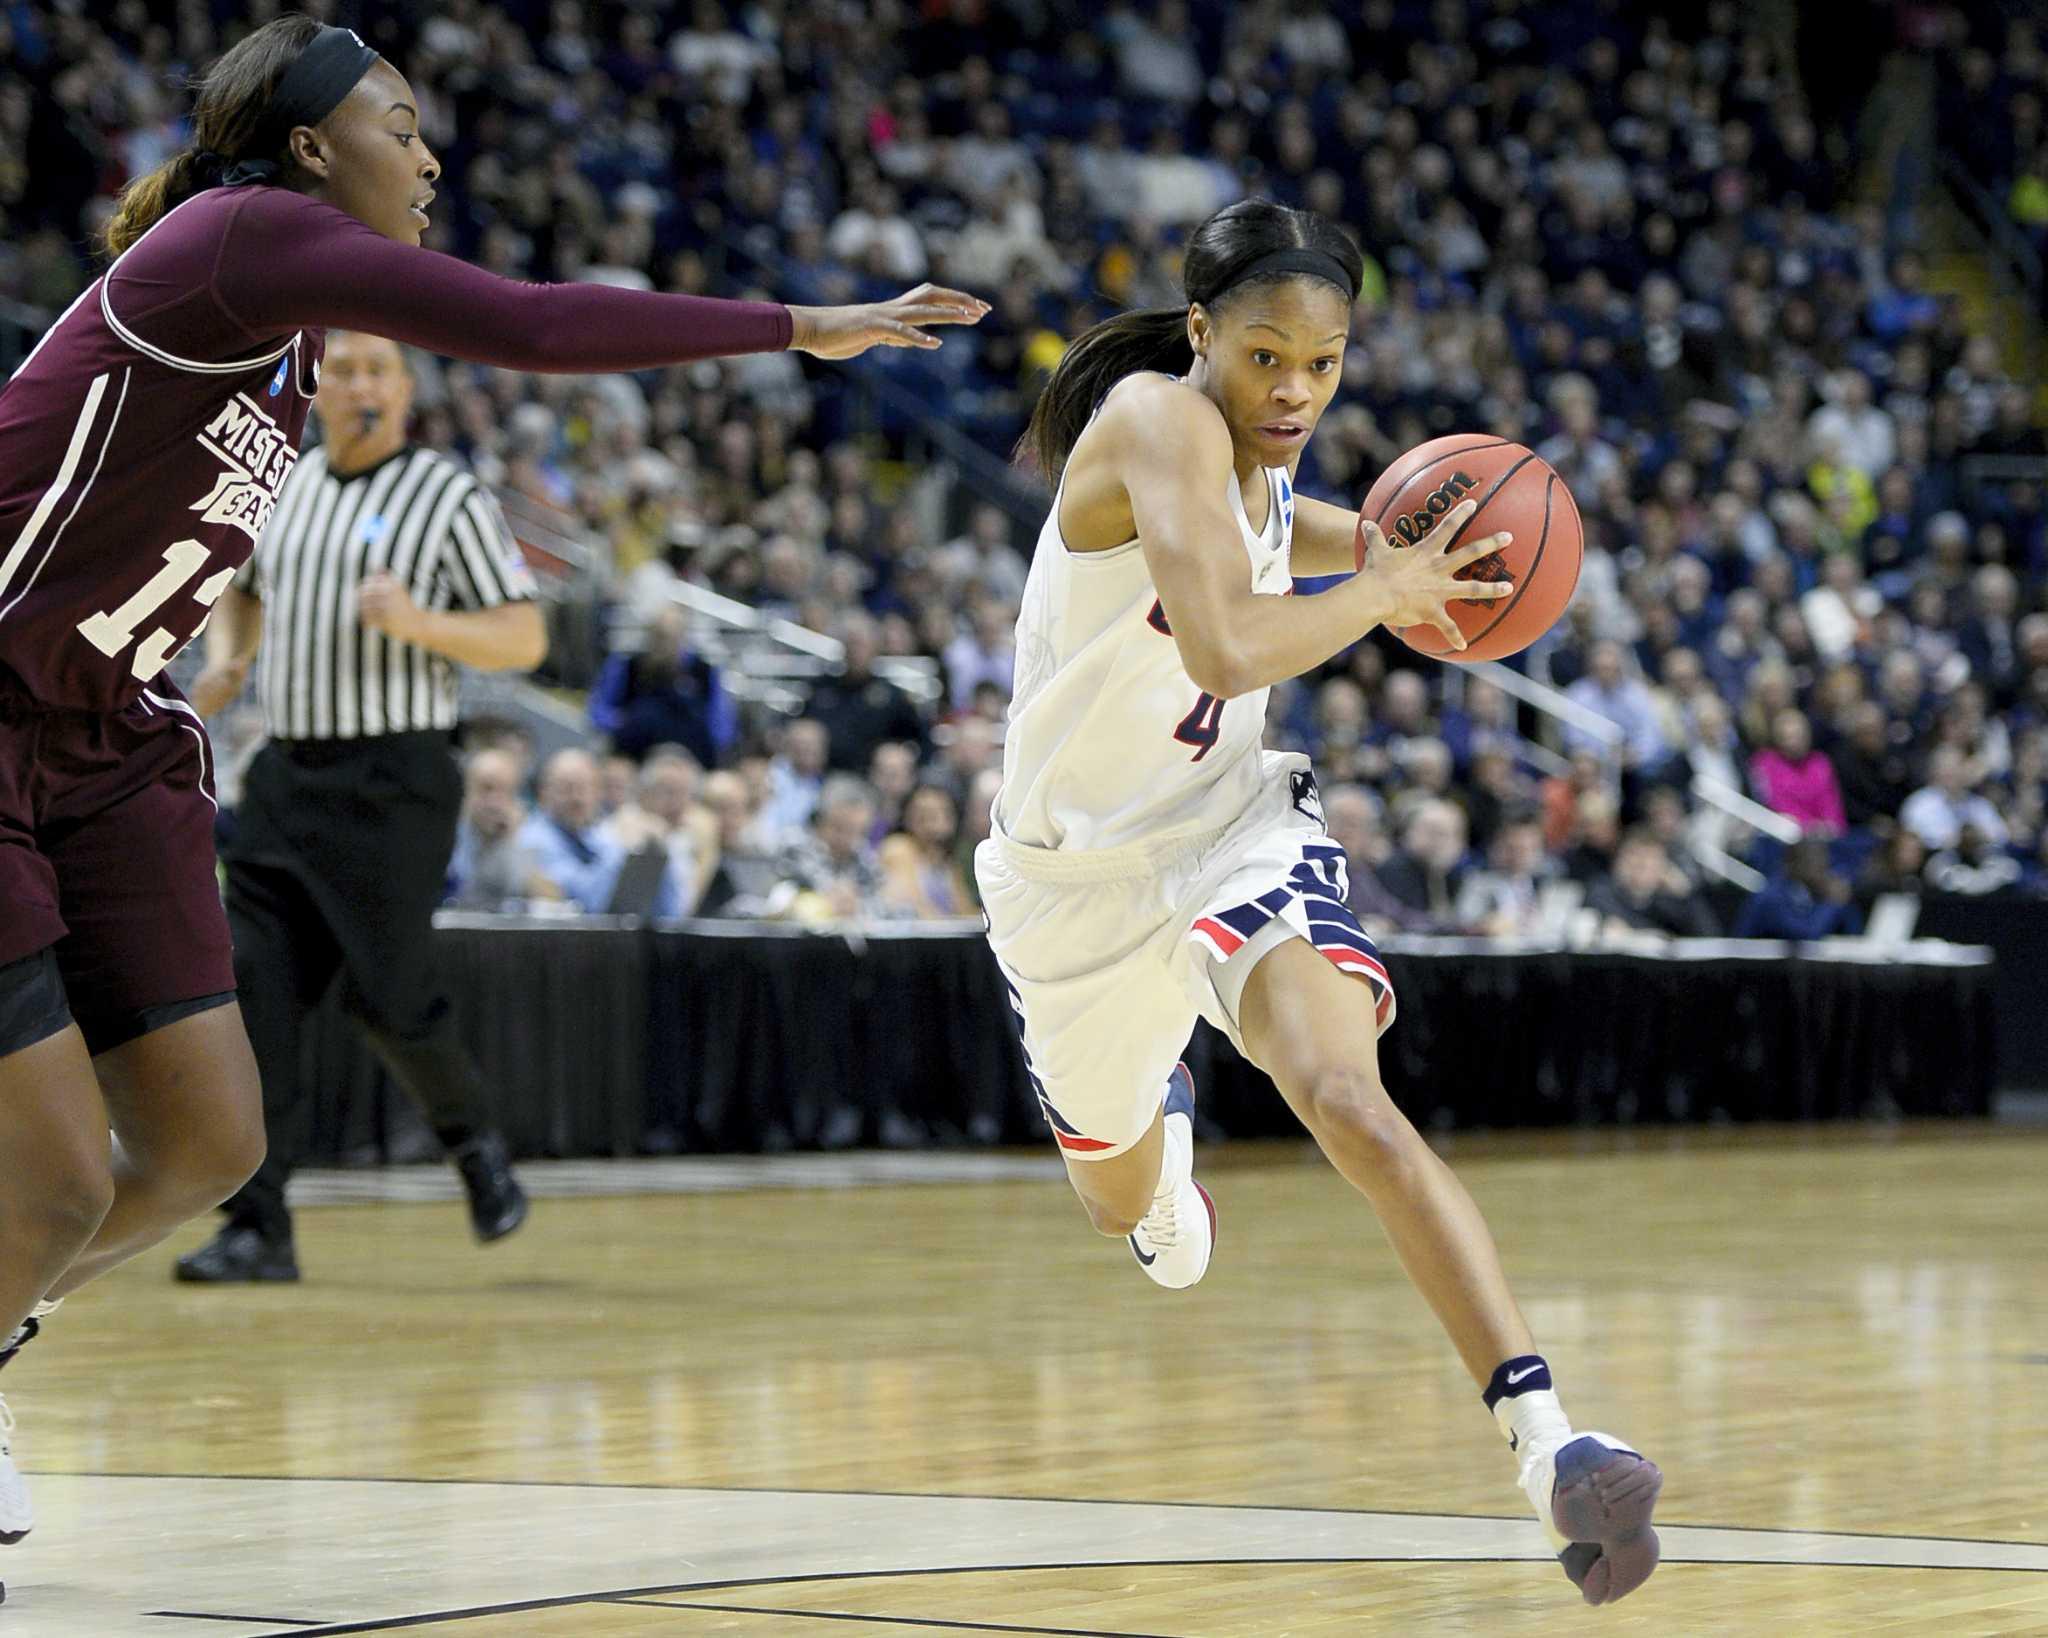 UCONN's Stewart, Jefferson, Tuck Headline List of Top College Prospects for WNBA Draft 2016